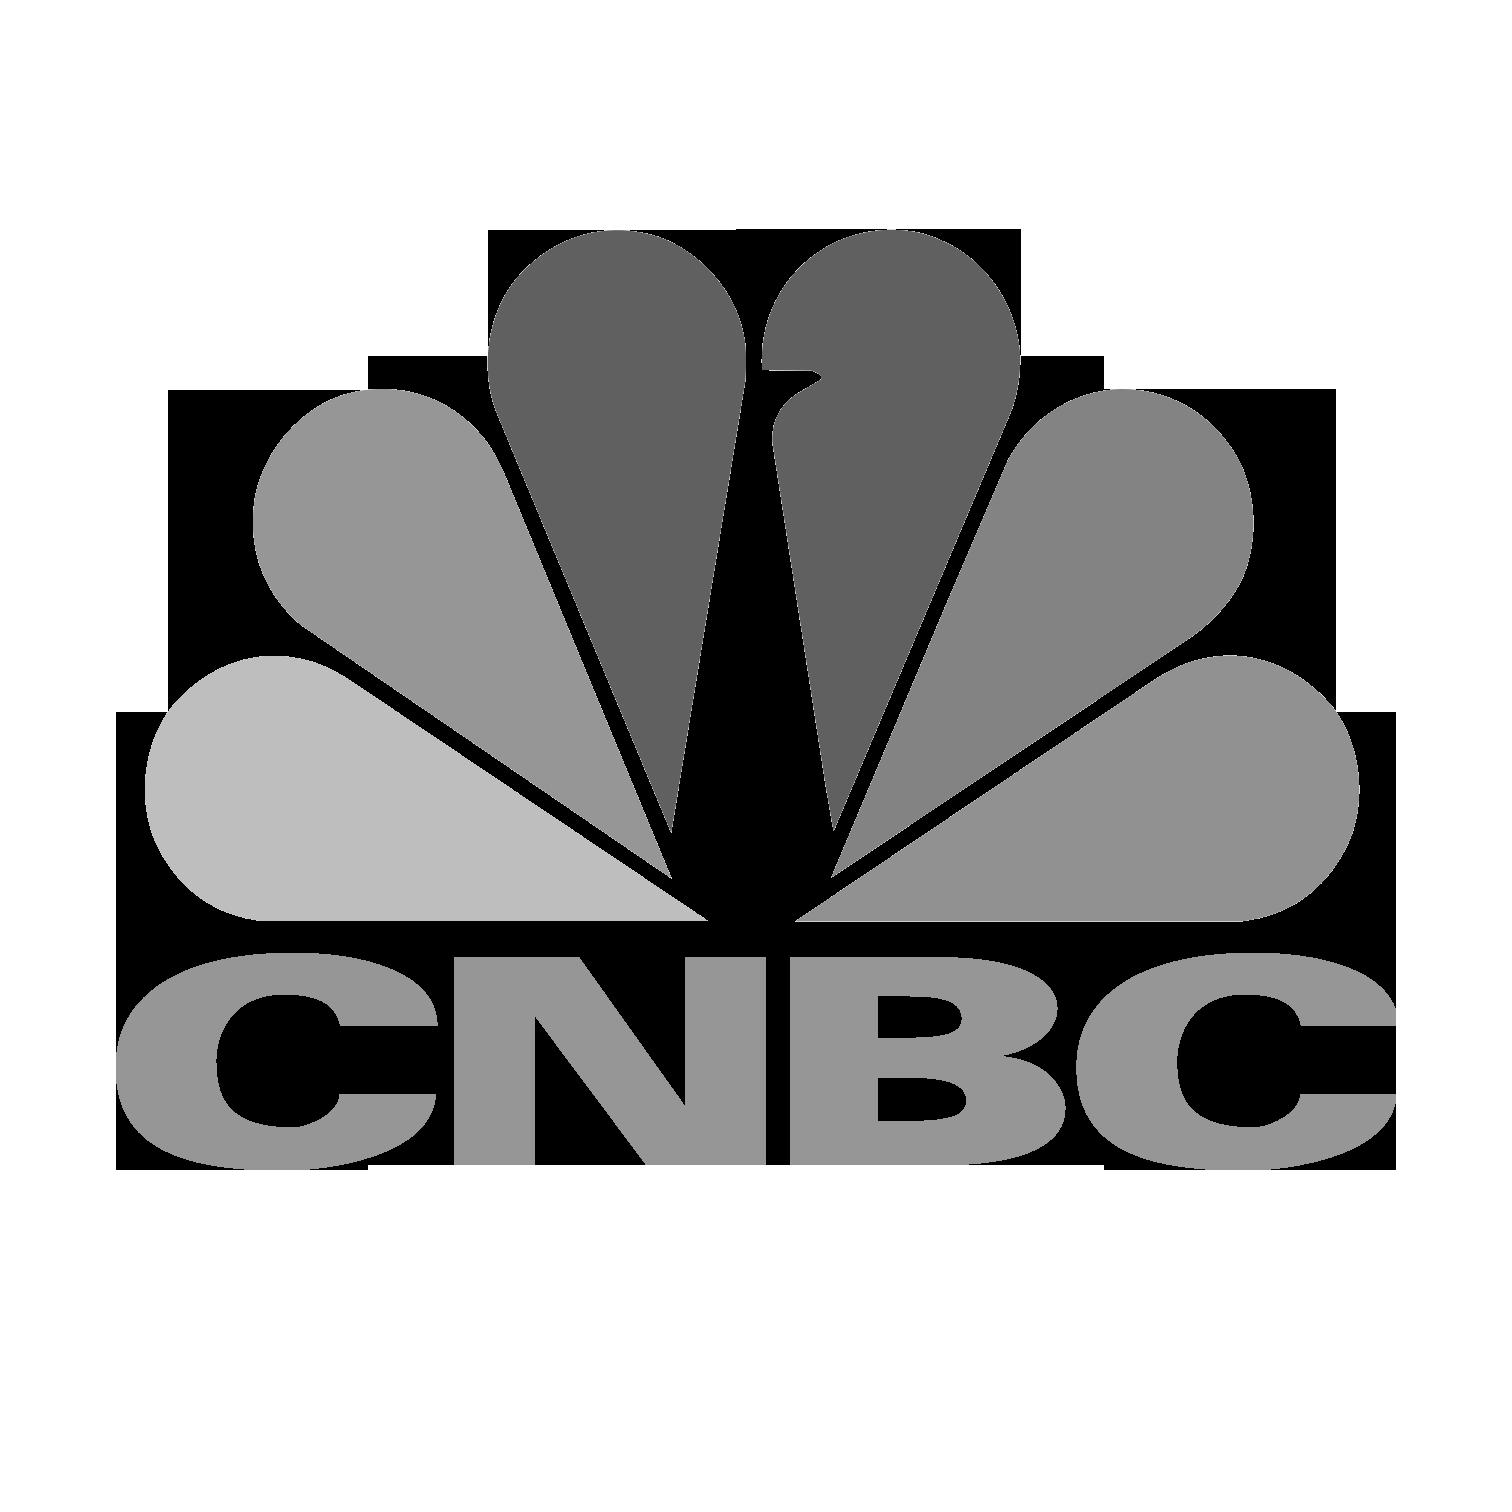 CNBC_logo grey.png